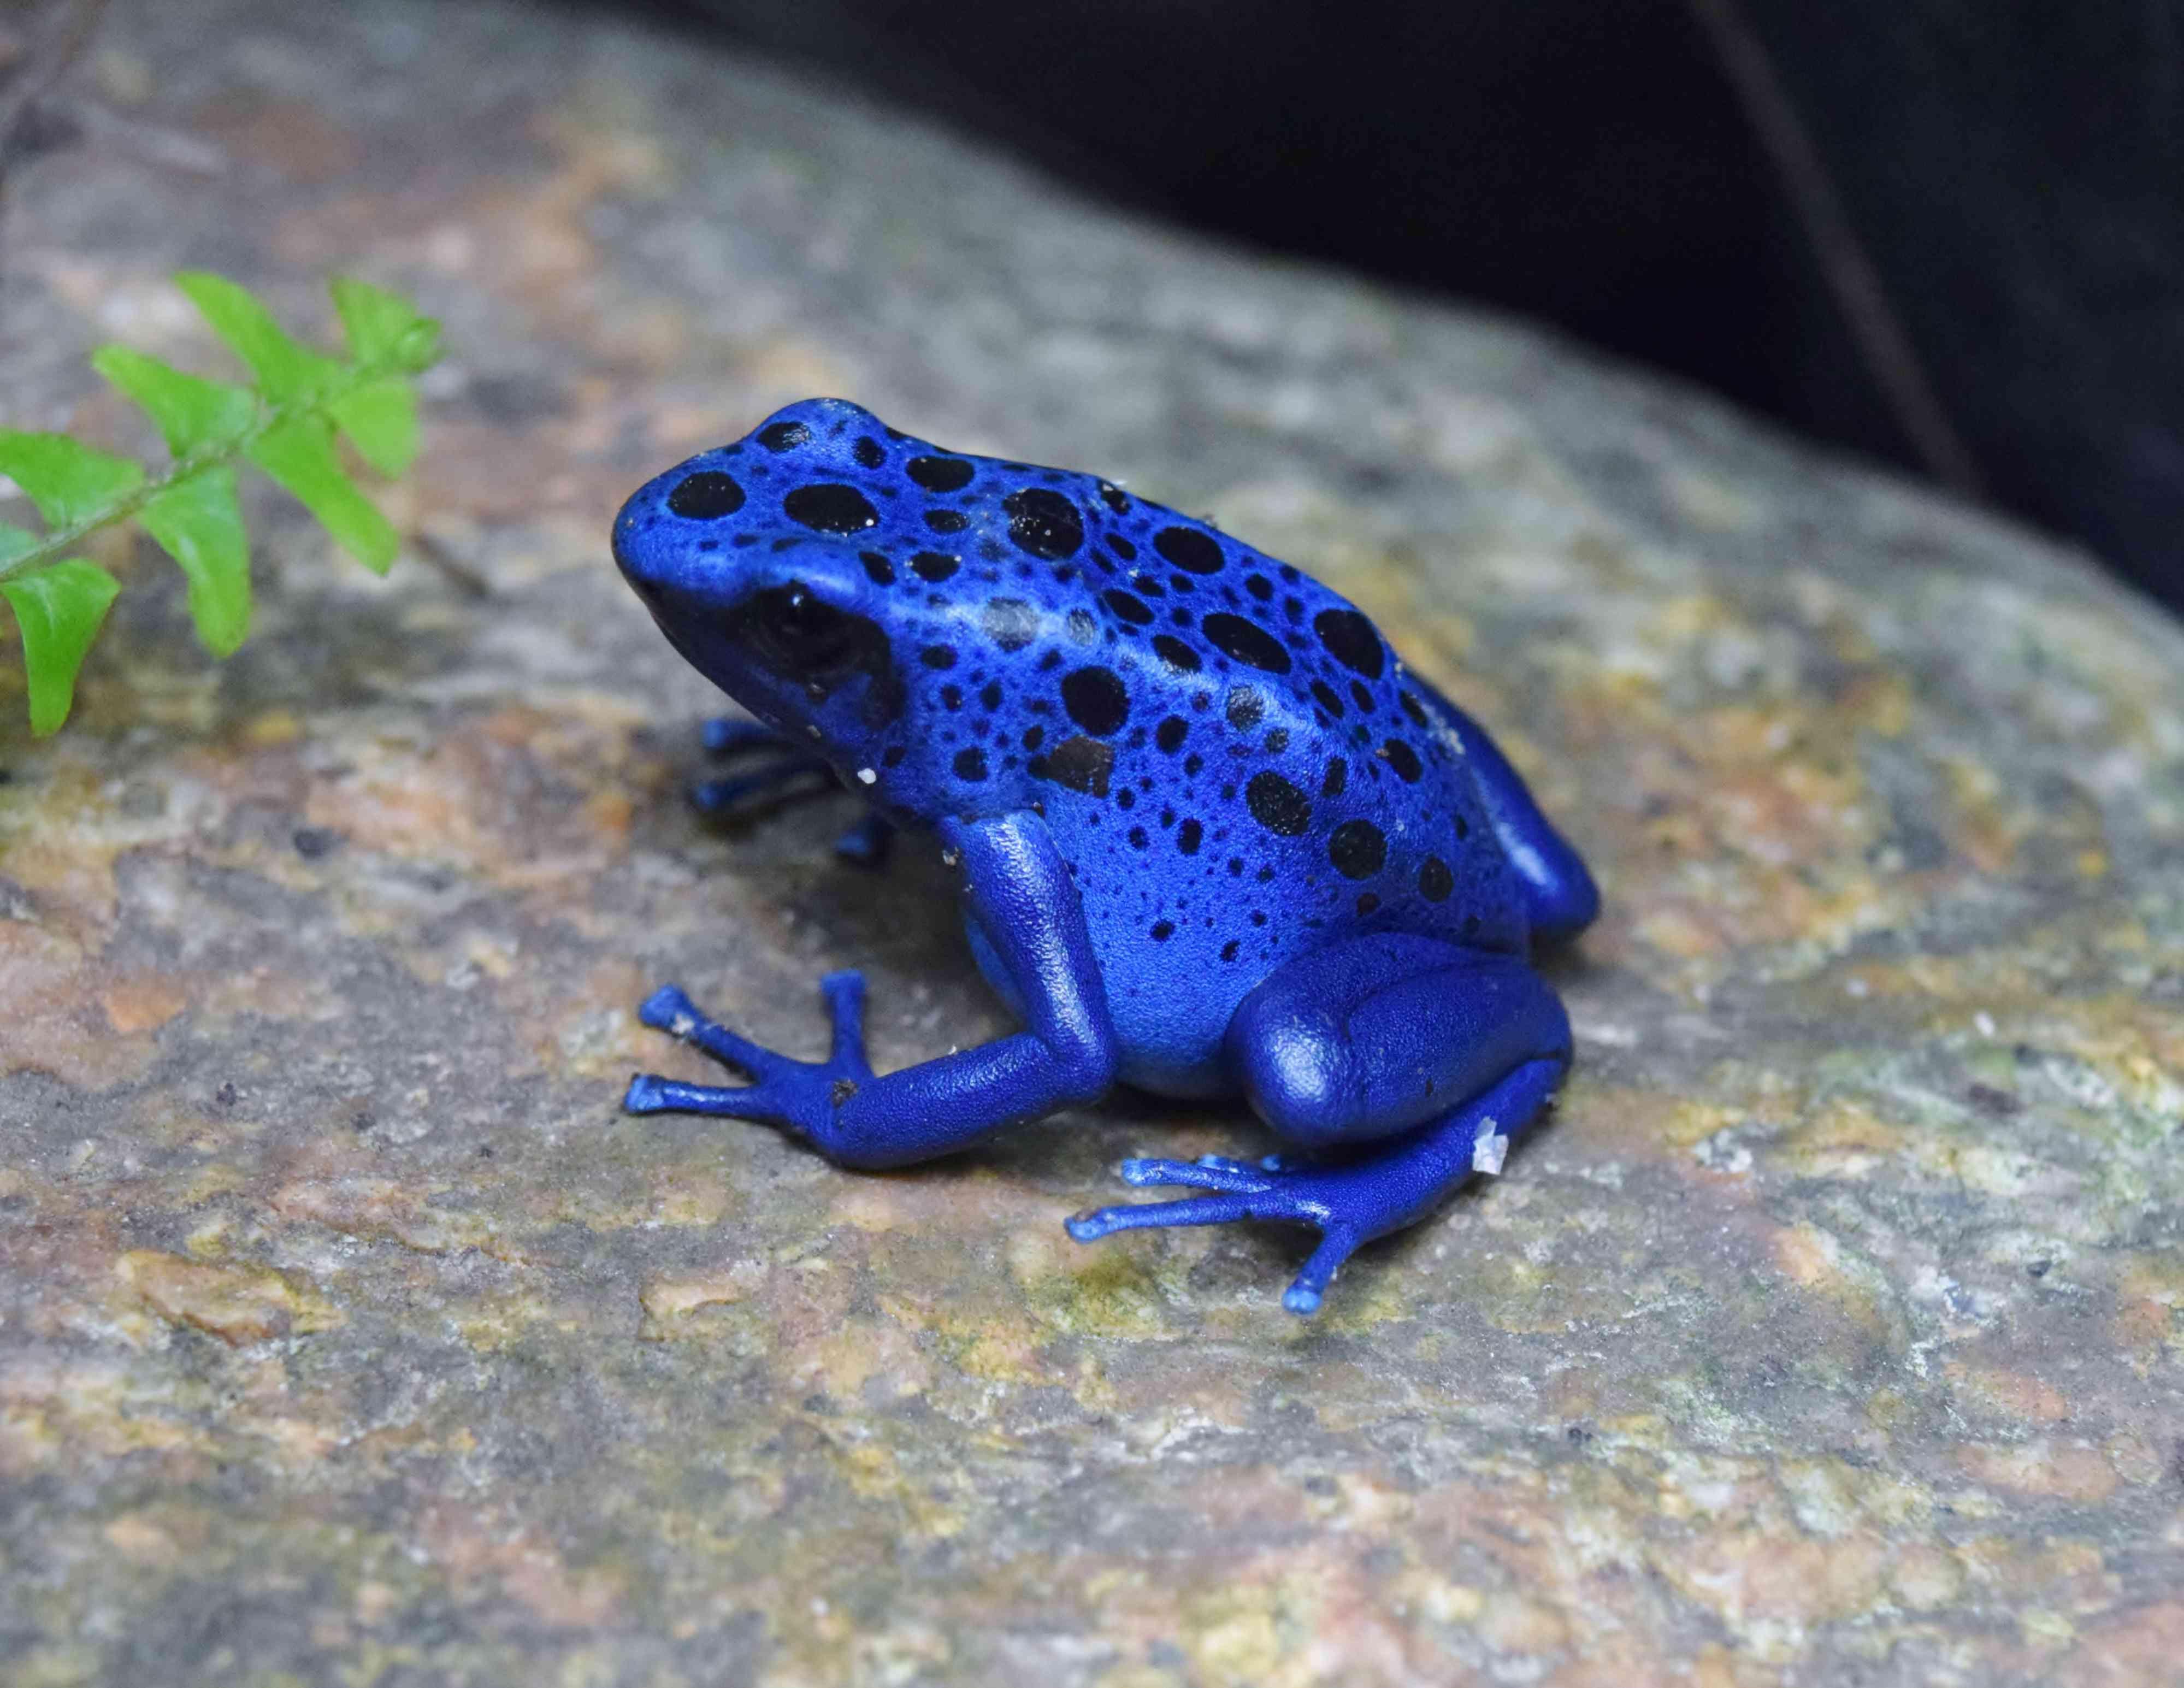 Blue poison dart frog with black spots sitting on rock